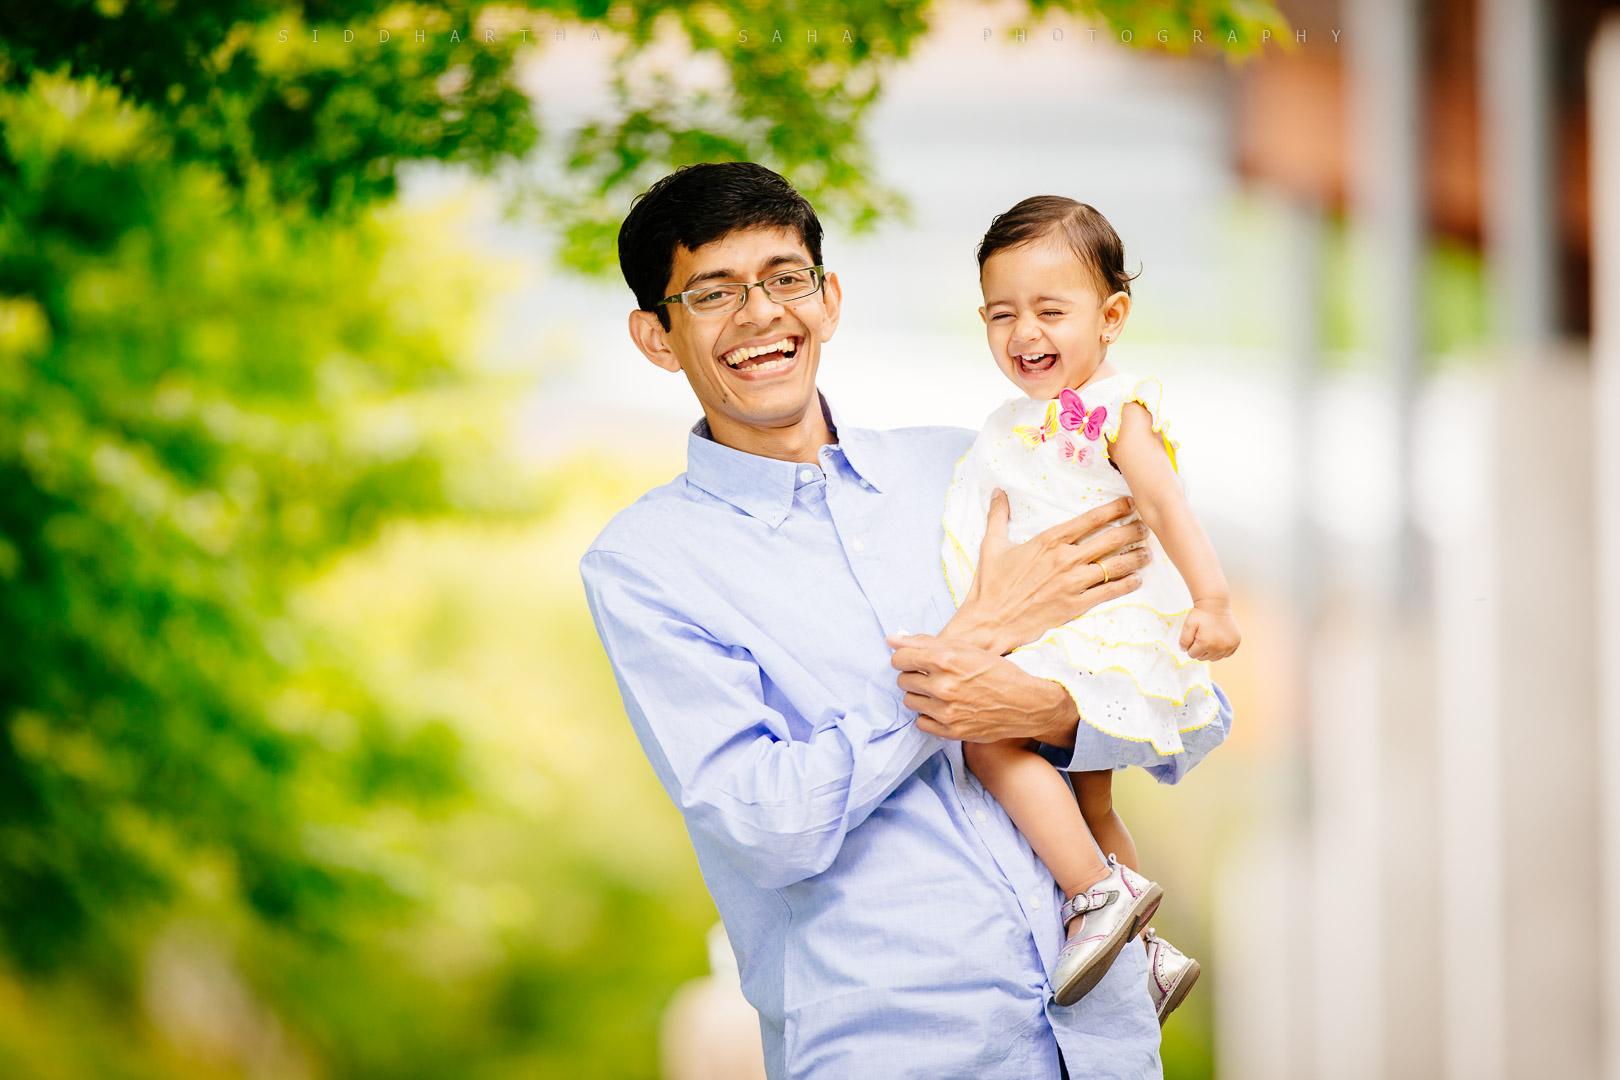 2015-08-08 - Padmaja Ketan Family Photoshoot - _05Y8585